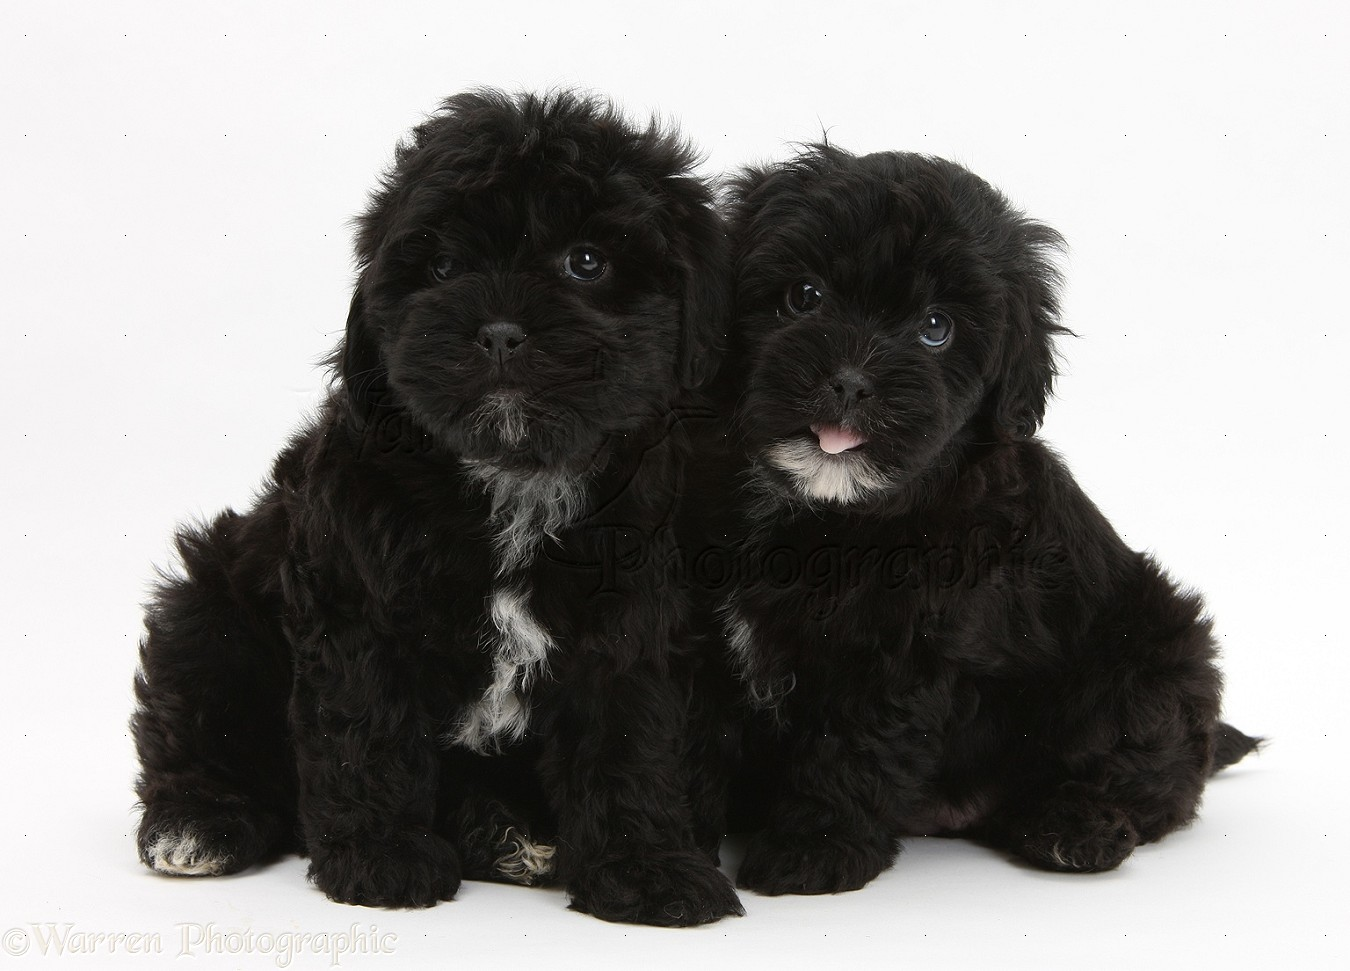 Dogs Black Pooshi Poodle X Shih Tzu Pups Photo Wp21897